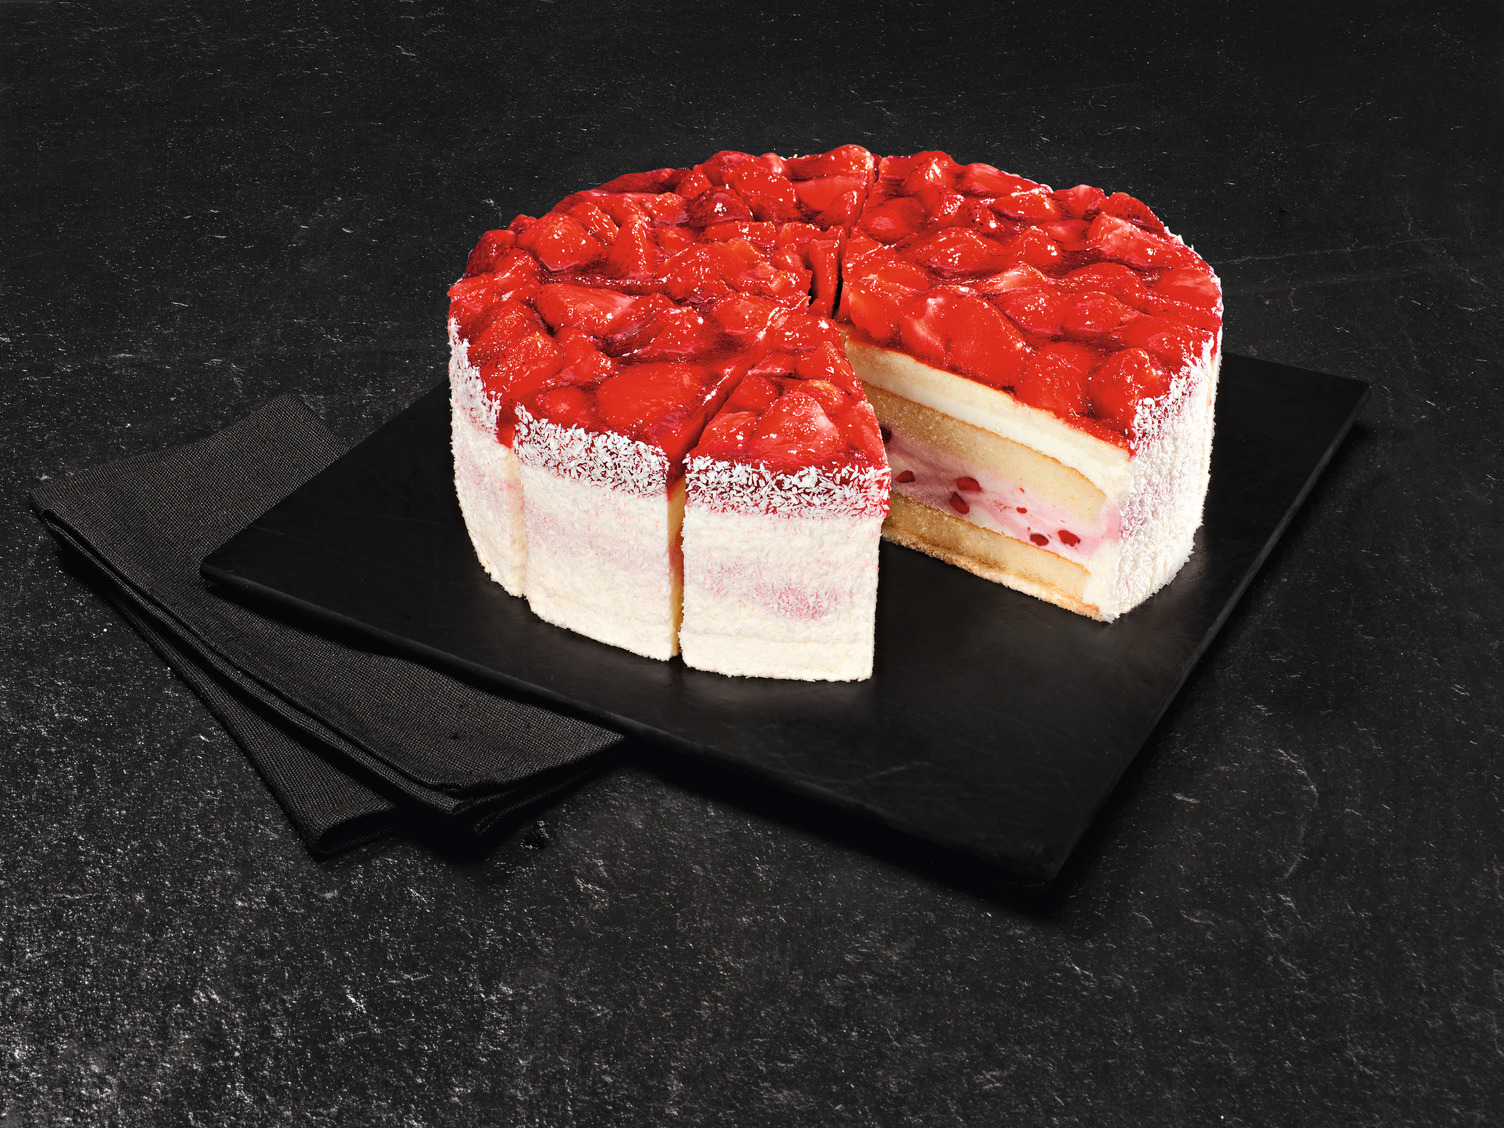 NESTLE SCHOELLER Backwaren UNSERE PRACHTSTÜCKE CLASSICS Erdbeer Buttermilch Torte vorgeschnitten 2300 g